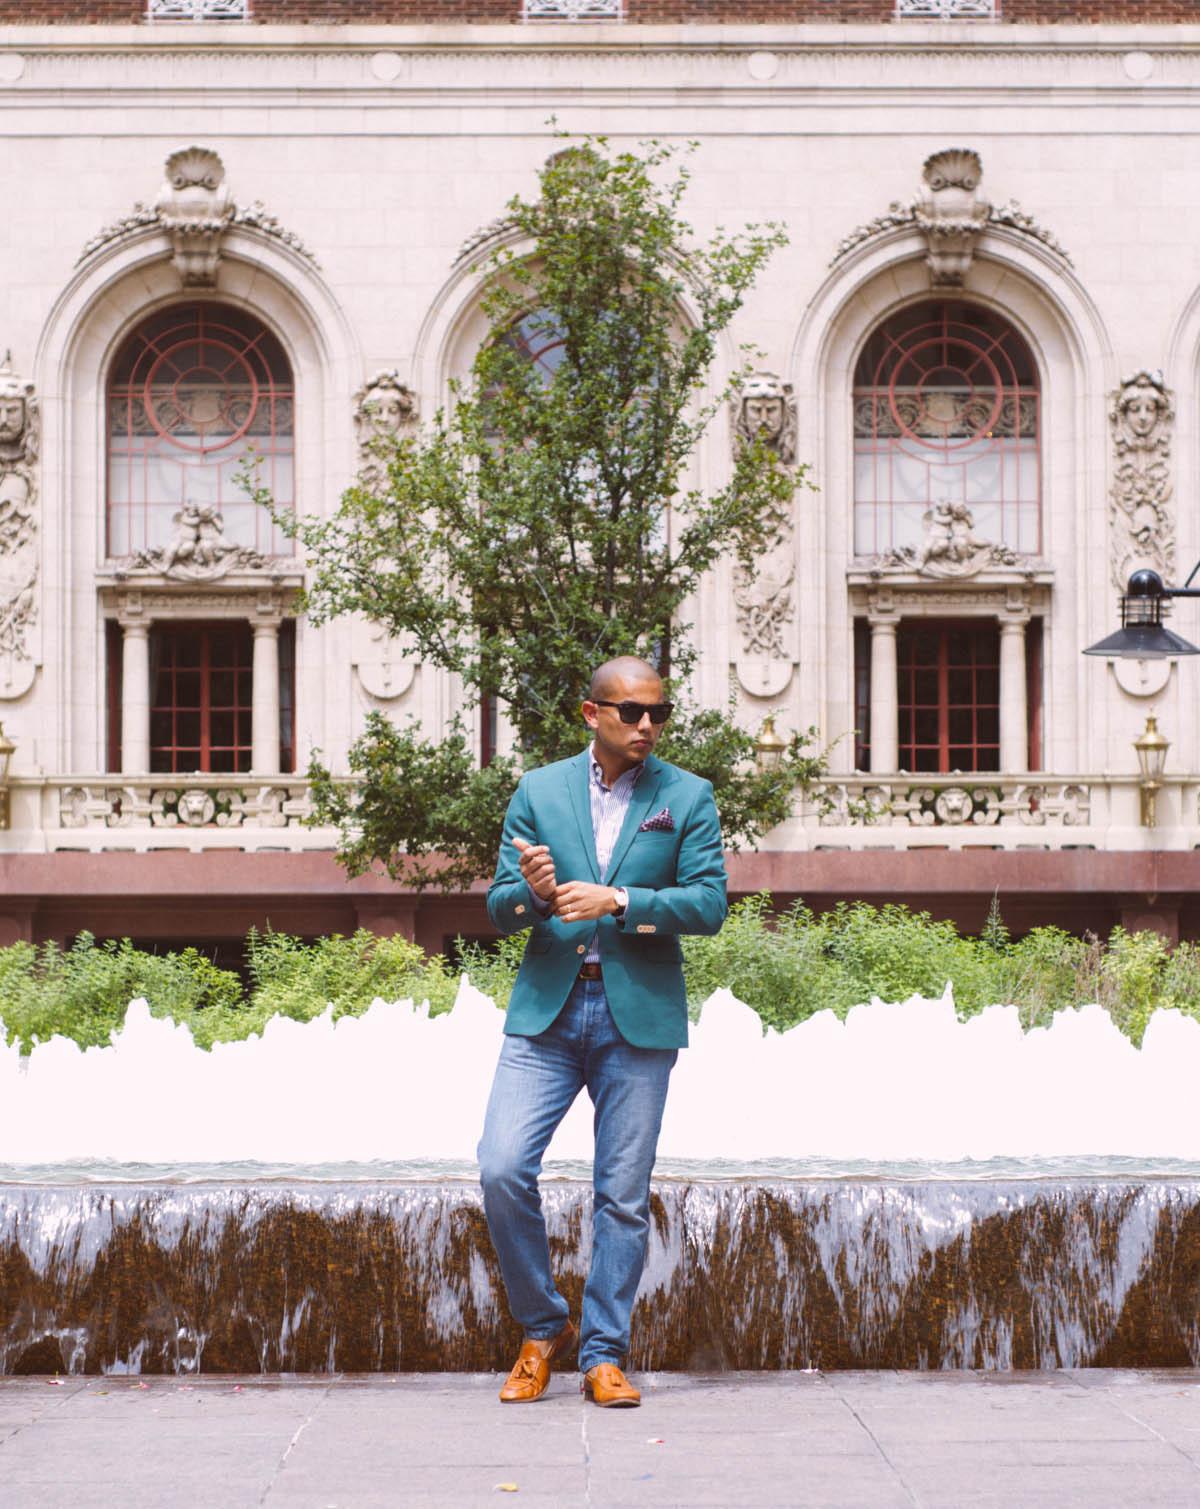 Jacket: H&M   Shirt: Merona   Jeans: Levis   Shoes: Mr. B's   Handkerchief: Nordstrom   Watch: Omega   Sunglasses: RayBan   Belt: Vintage